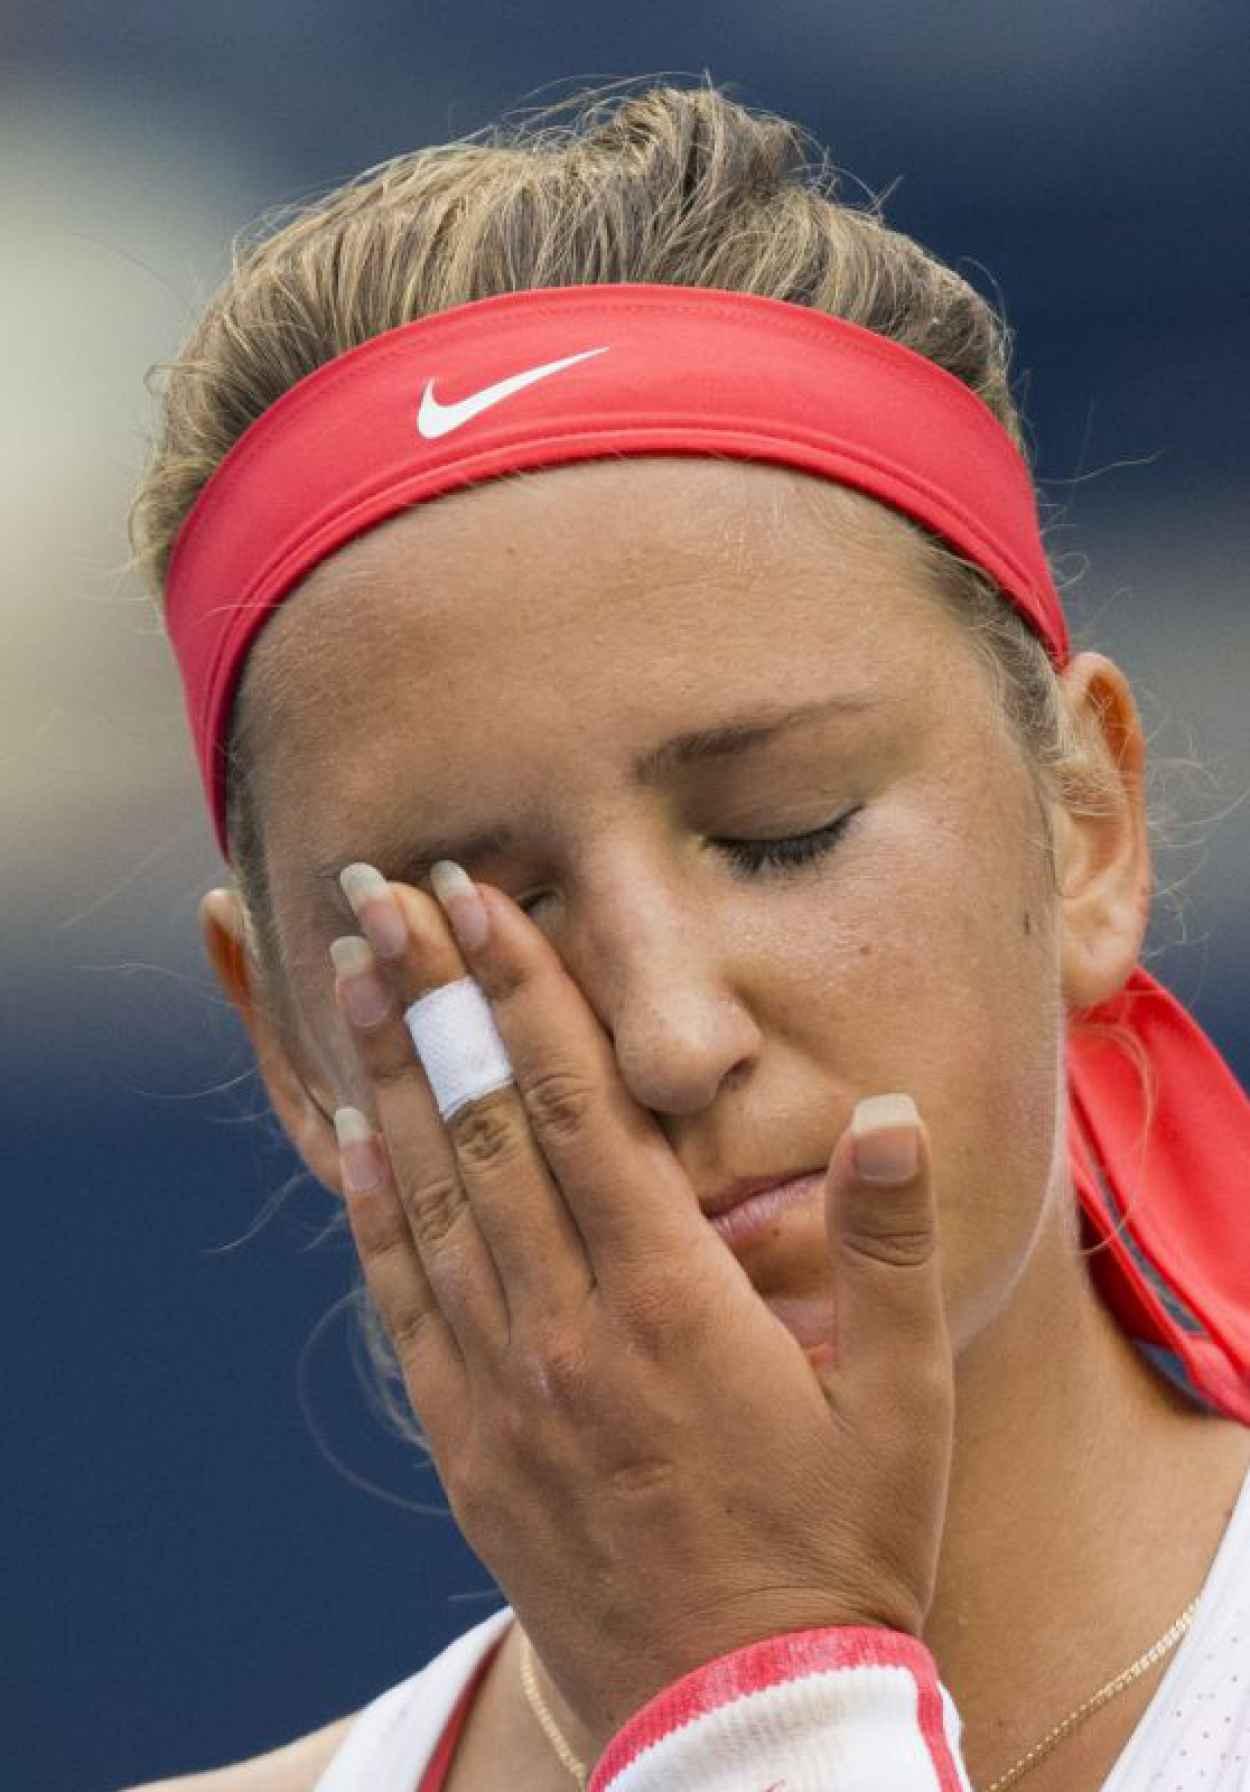 Victoria Azarenka - 2015 Rogers Cup in Toronto, 3rd Round-1